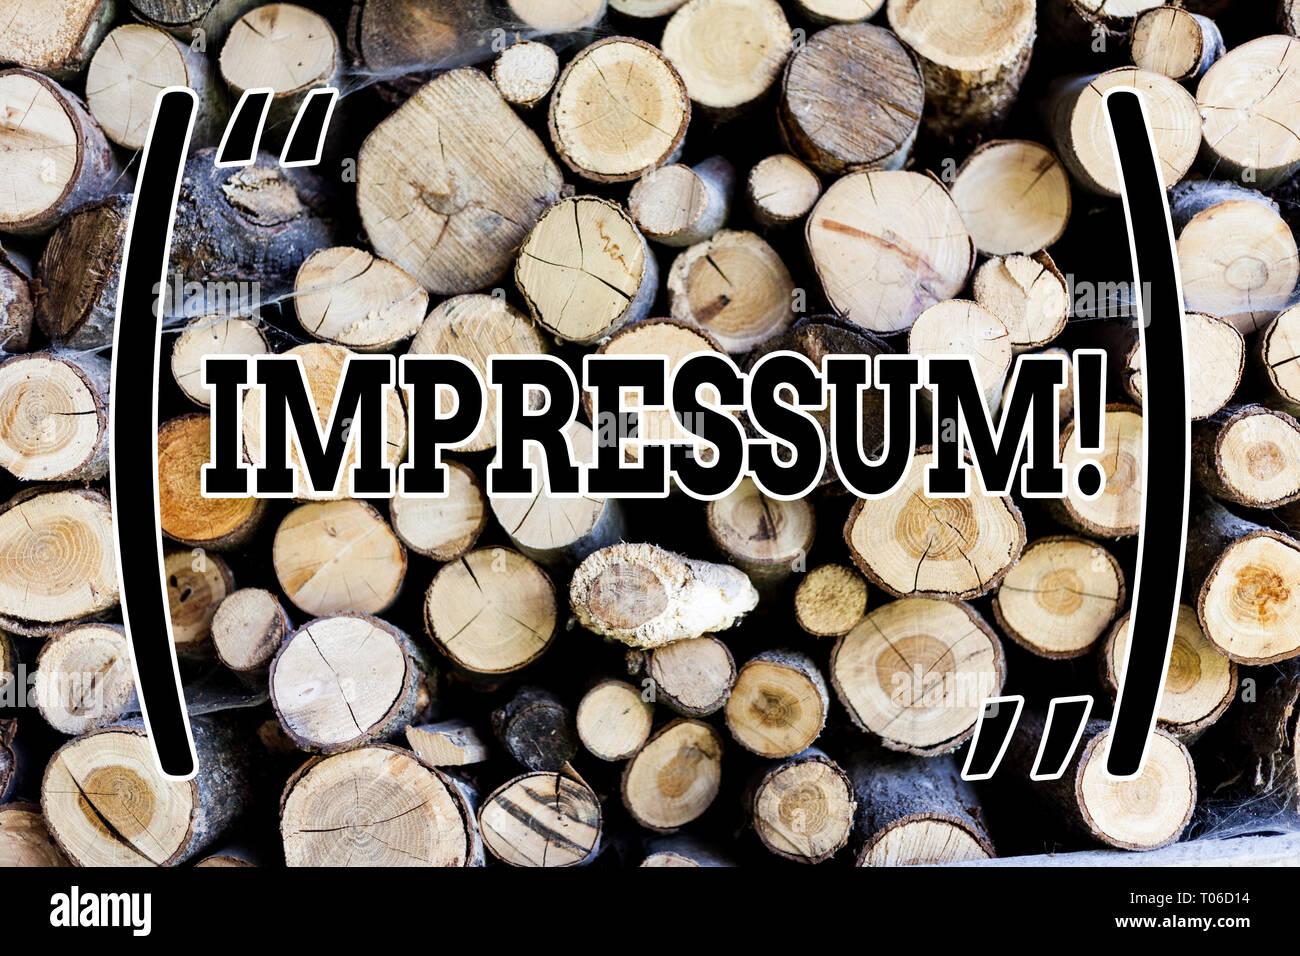 Text sign showing Impressum. Business photo text Impressed Engraved Imprint Geranalysis statement ownership authorship Wooden background vintage wood  - Stock Image